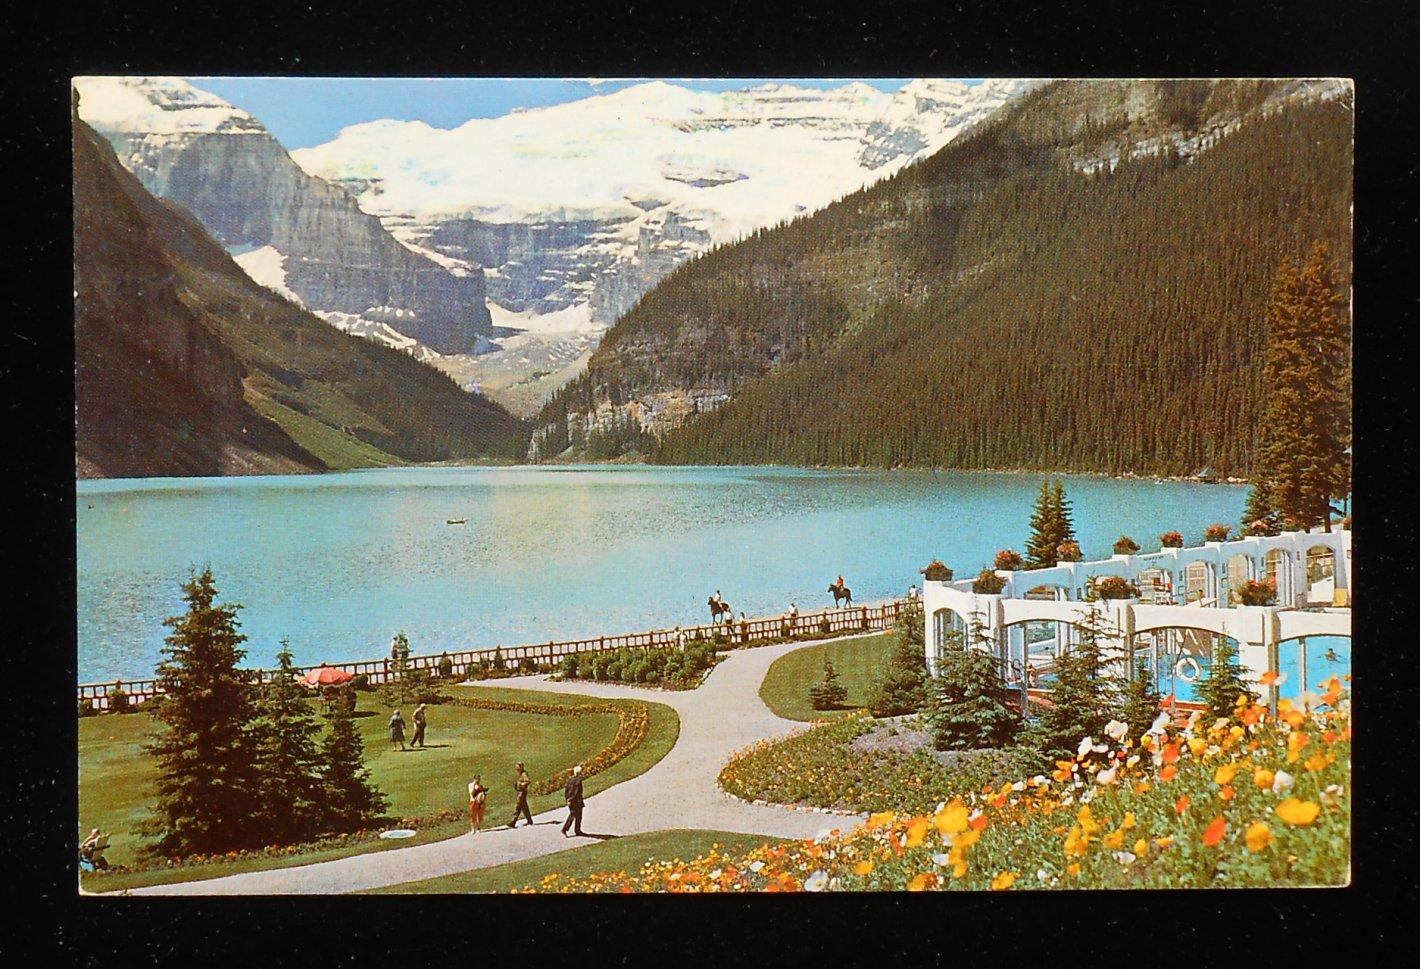 1966 Lake Louise Victoria Glacier Swimming Pool Grounds Chateau Lake Louise Ab C Ebay